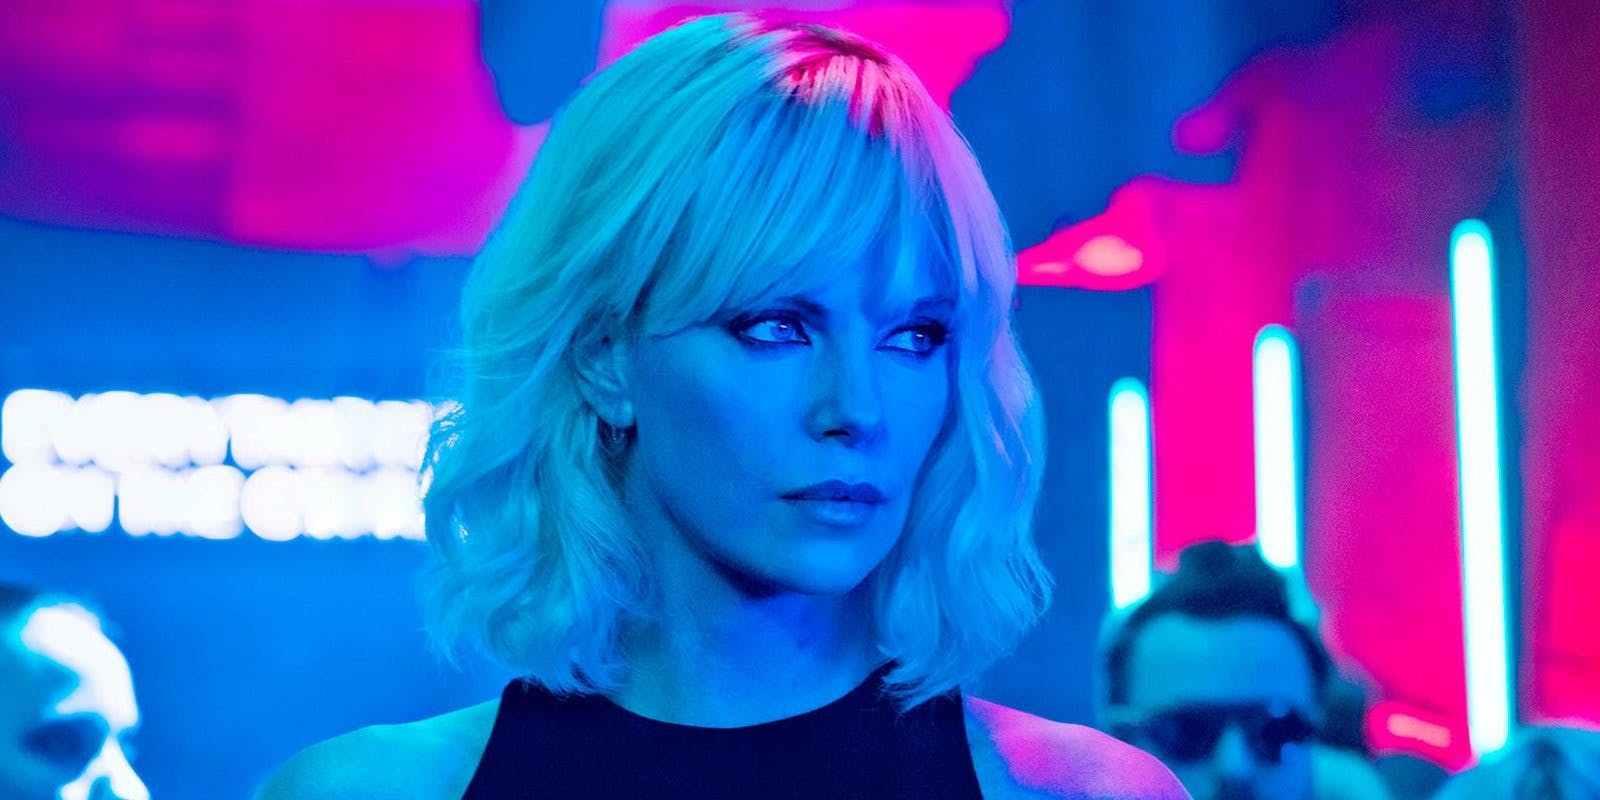 Charlize-Theron-as-Lorraine-in-Atomic-Blonde1 Atomic Blonde